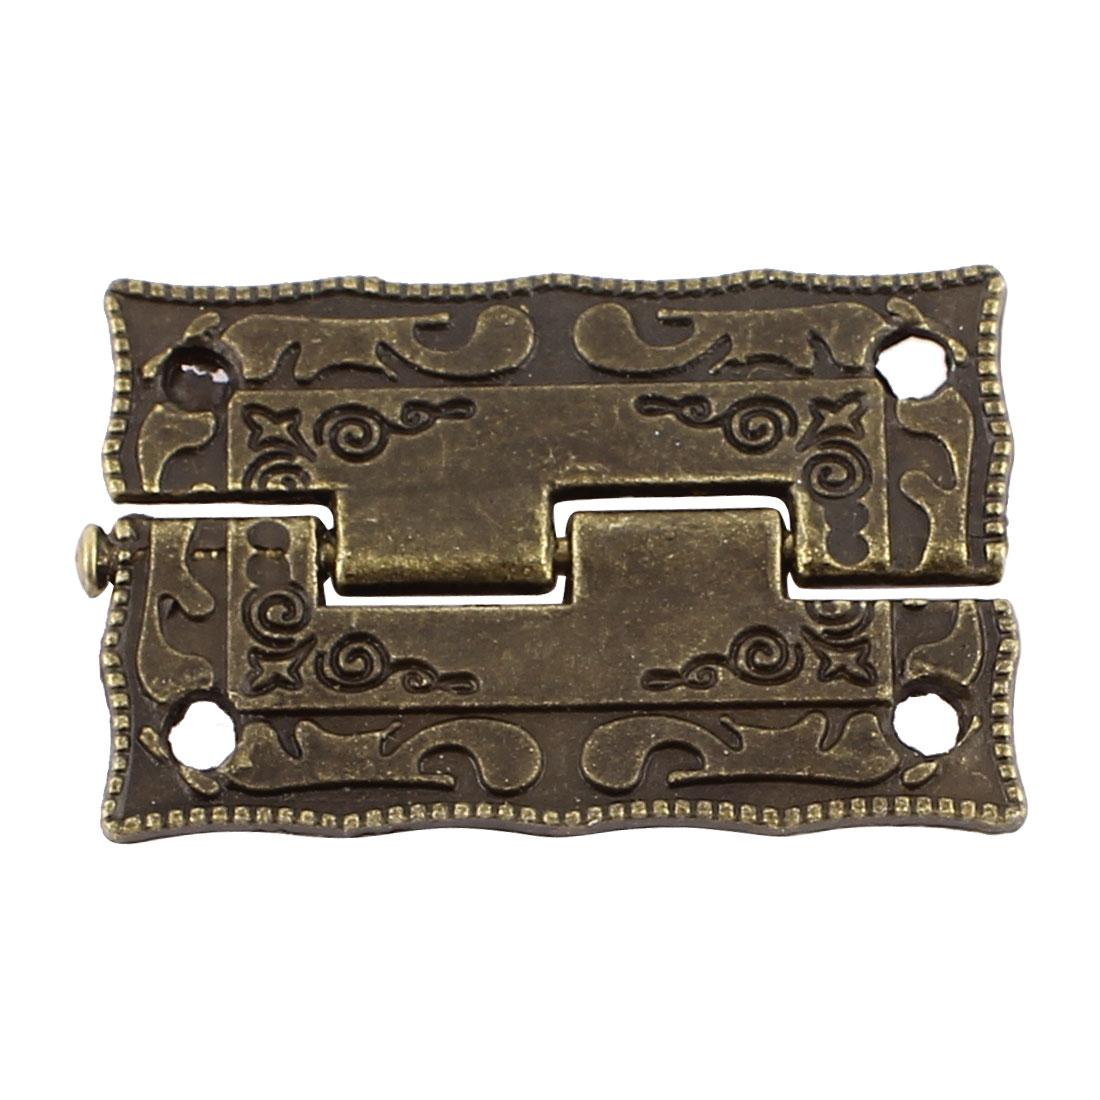 Door Jewelry Box Case Engraved Design Folding Butt Hinge Bronze Tone 37mmx23mm